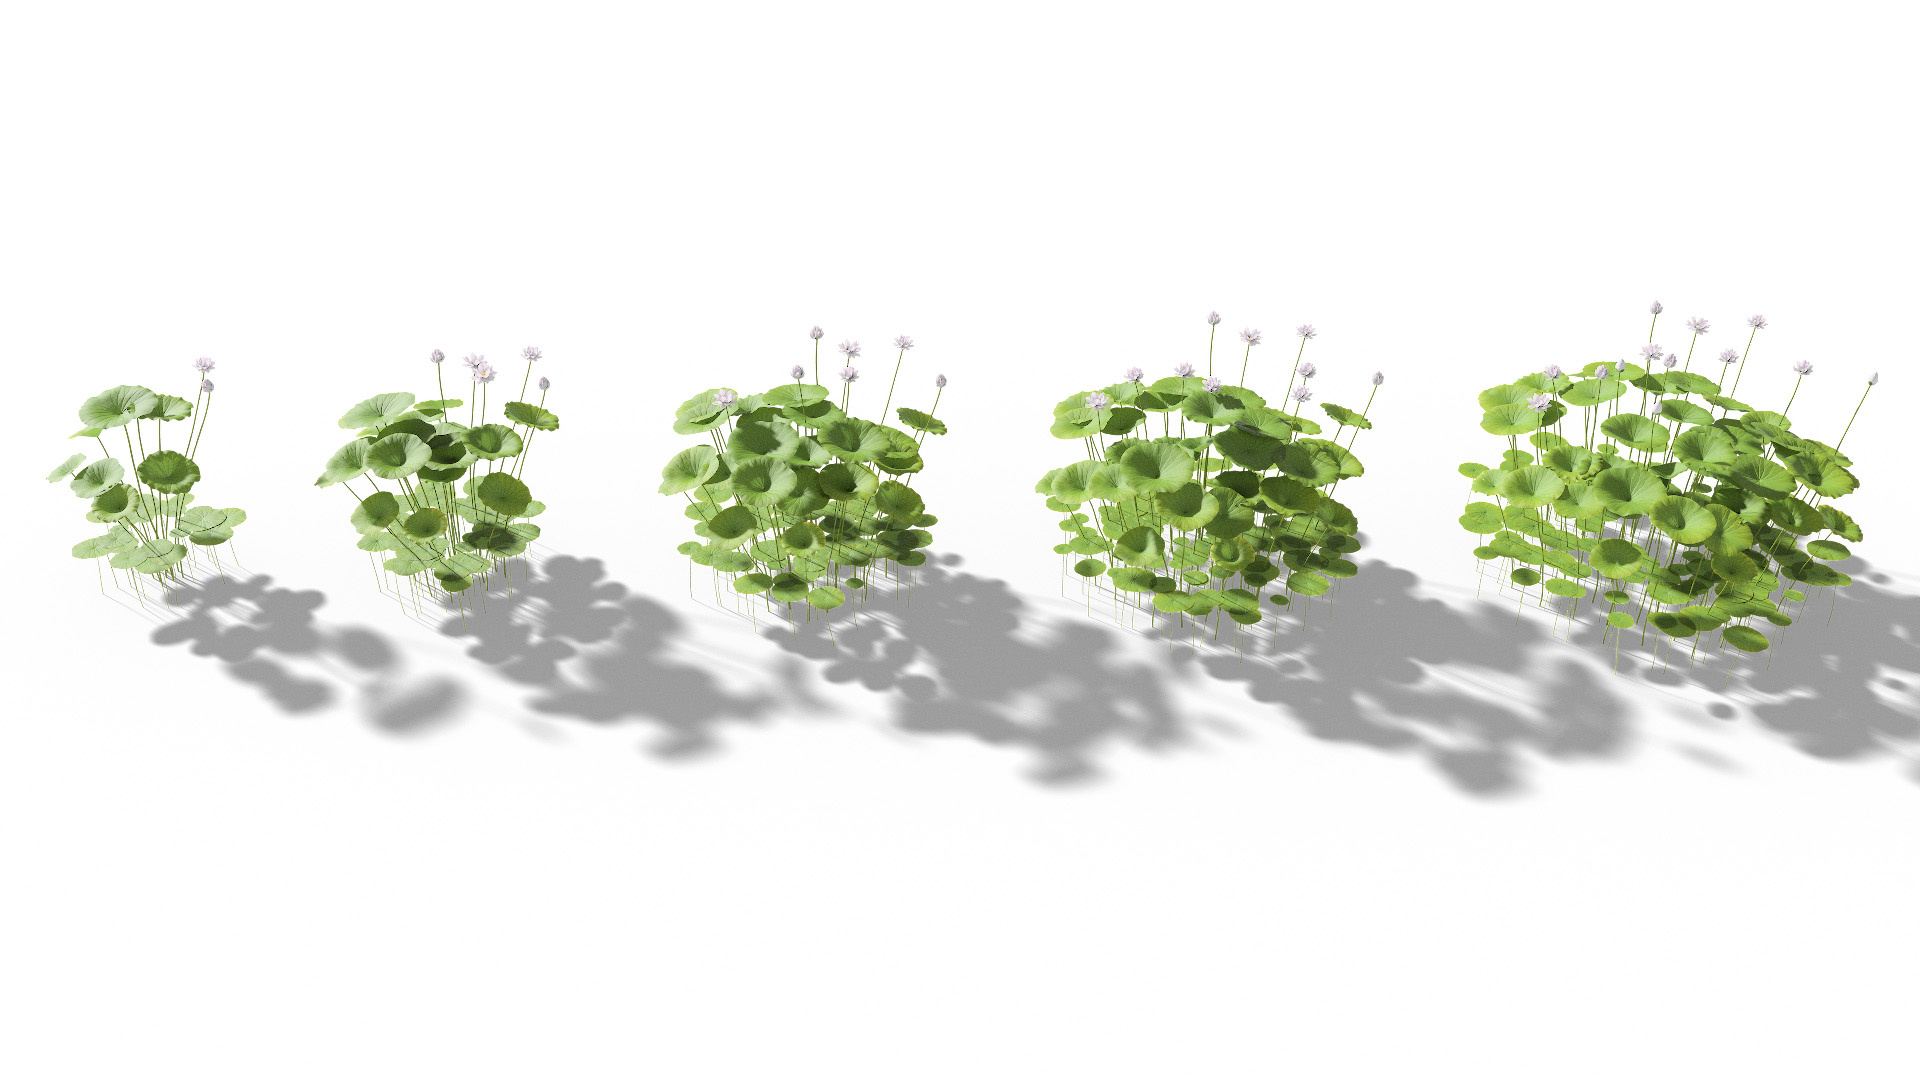 3D model of the Sacred lotus Nelumbo nucifera maturity variations